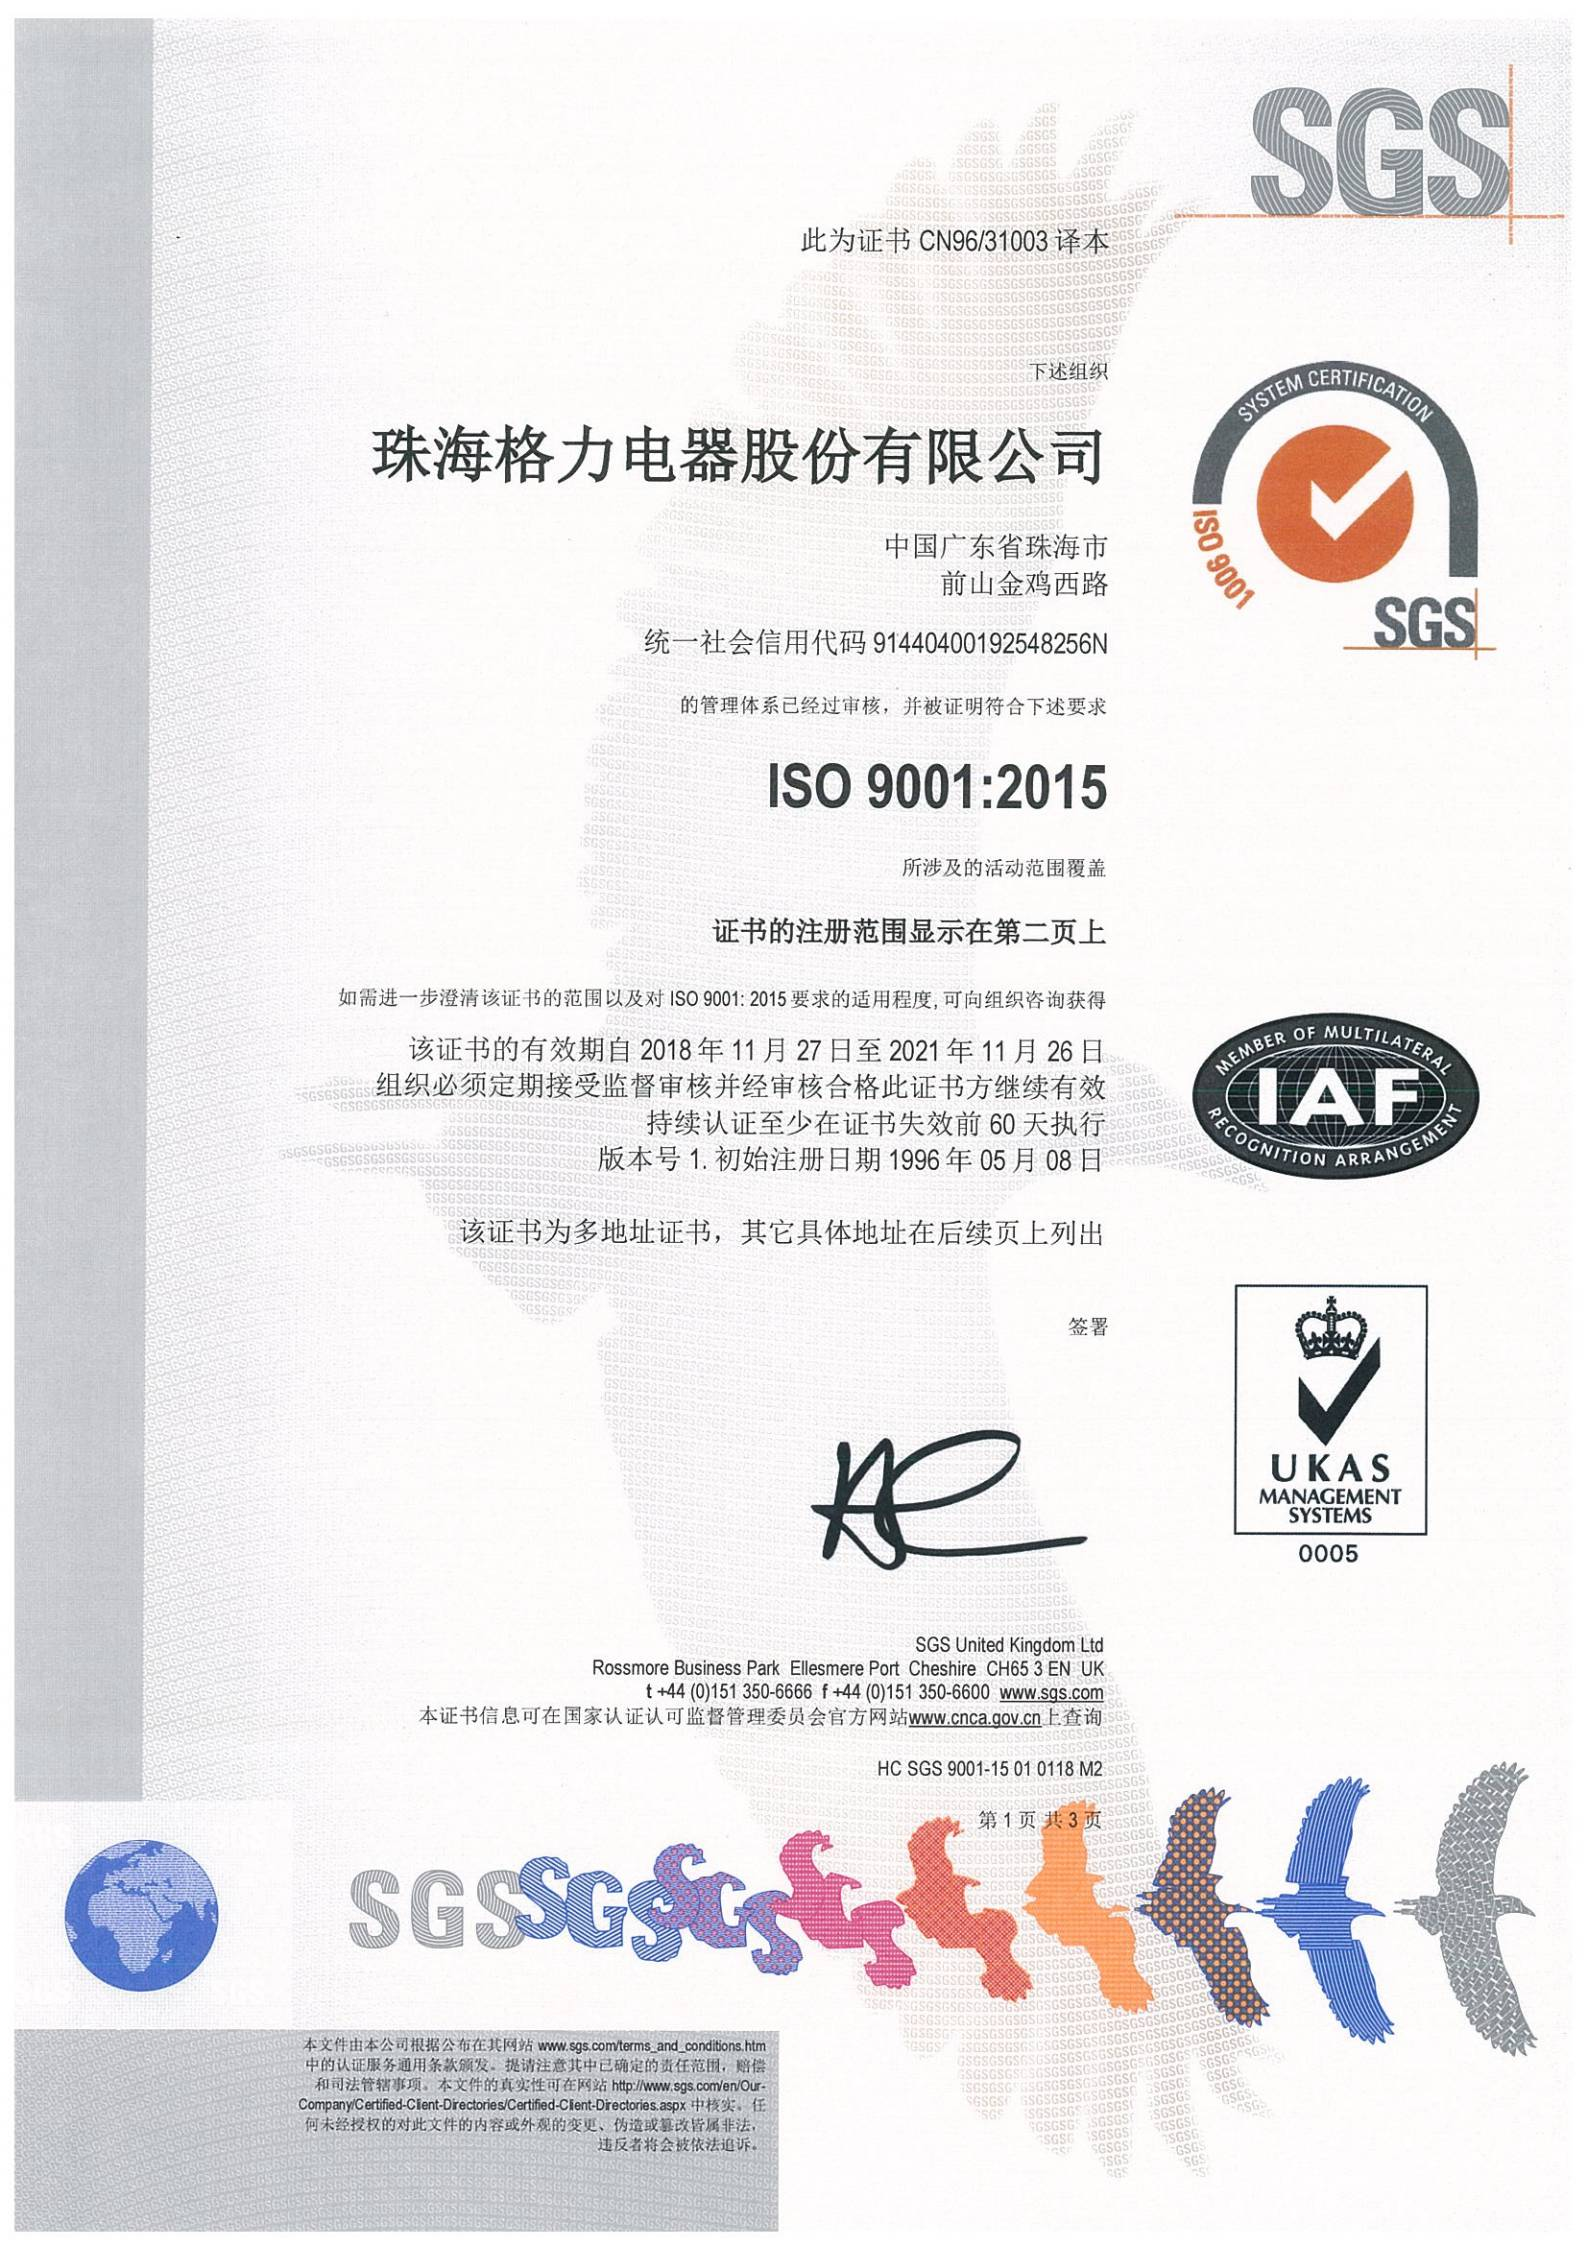 iso9001(質量體系)榮譽證書